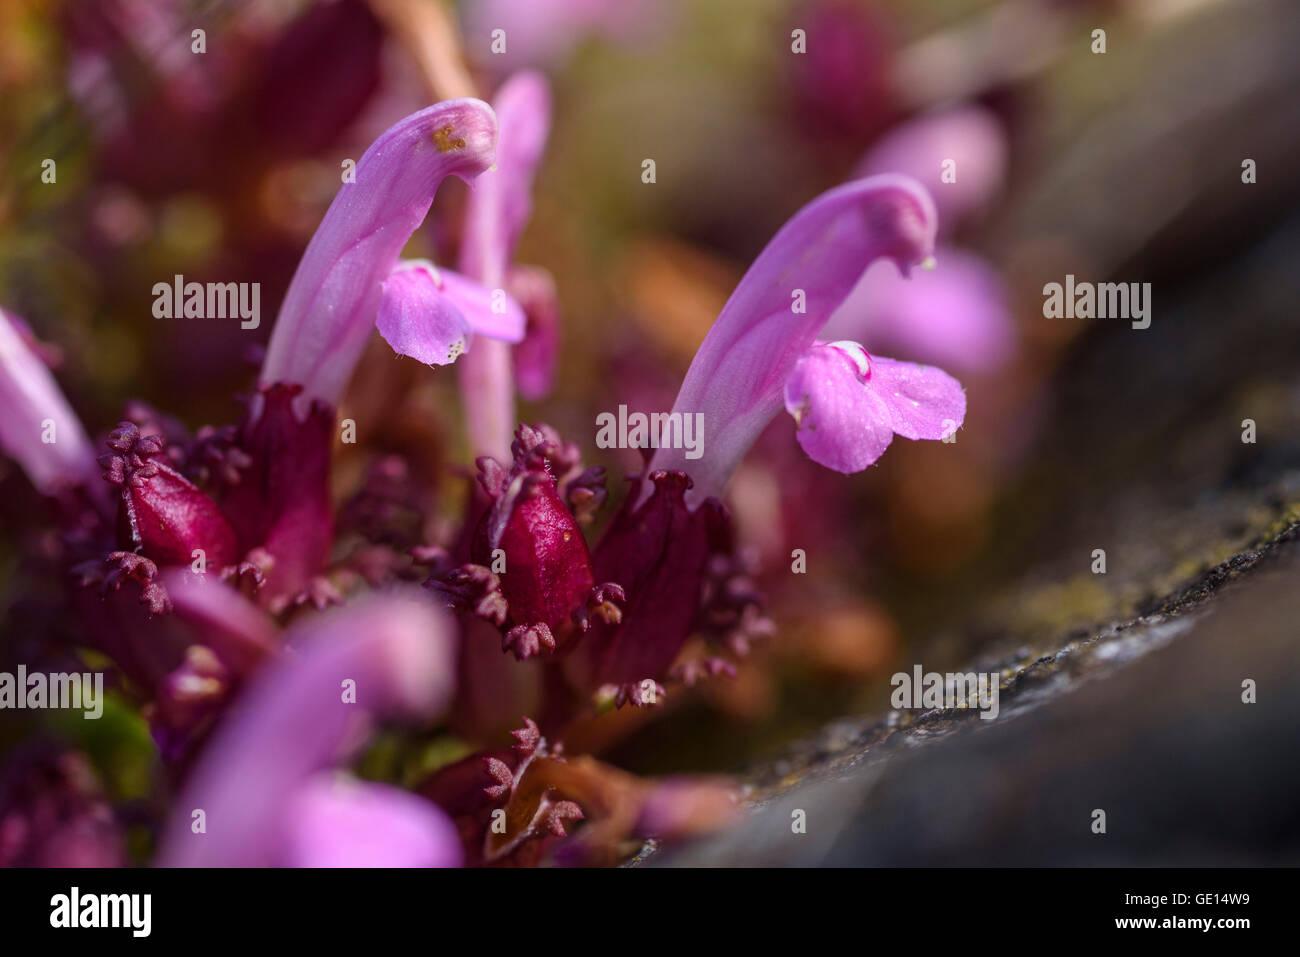 Lousewort, Pedicularis Sylvatica, wildflower, Fleet Valley, Dumfries & Galloway, Scotland - Stock Image